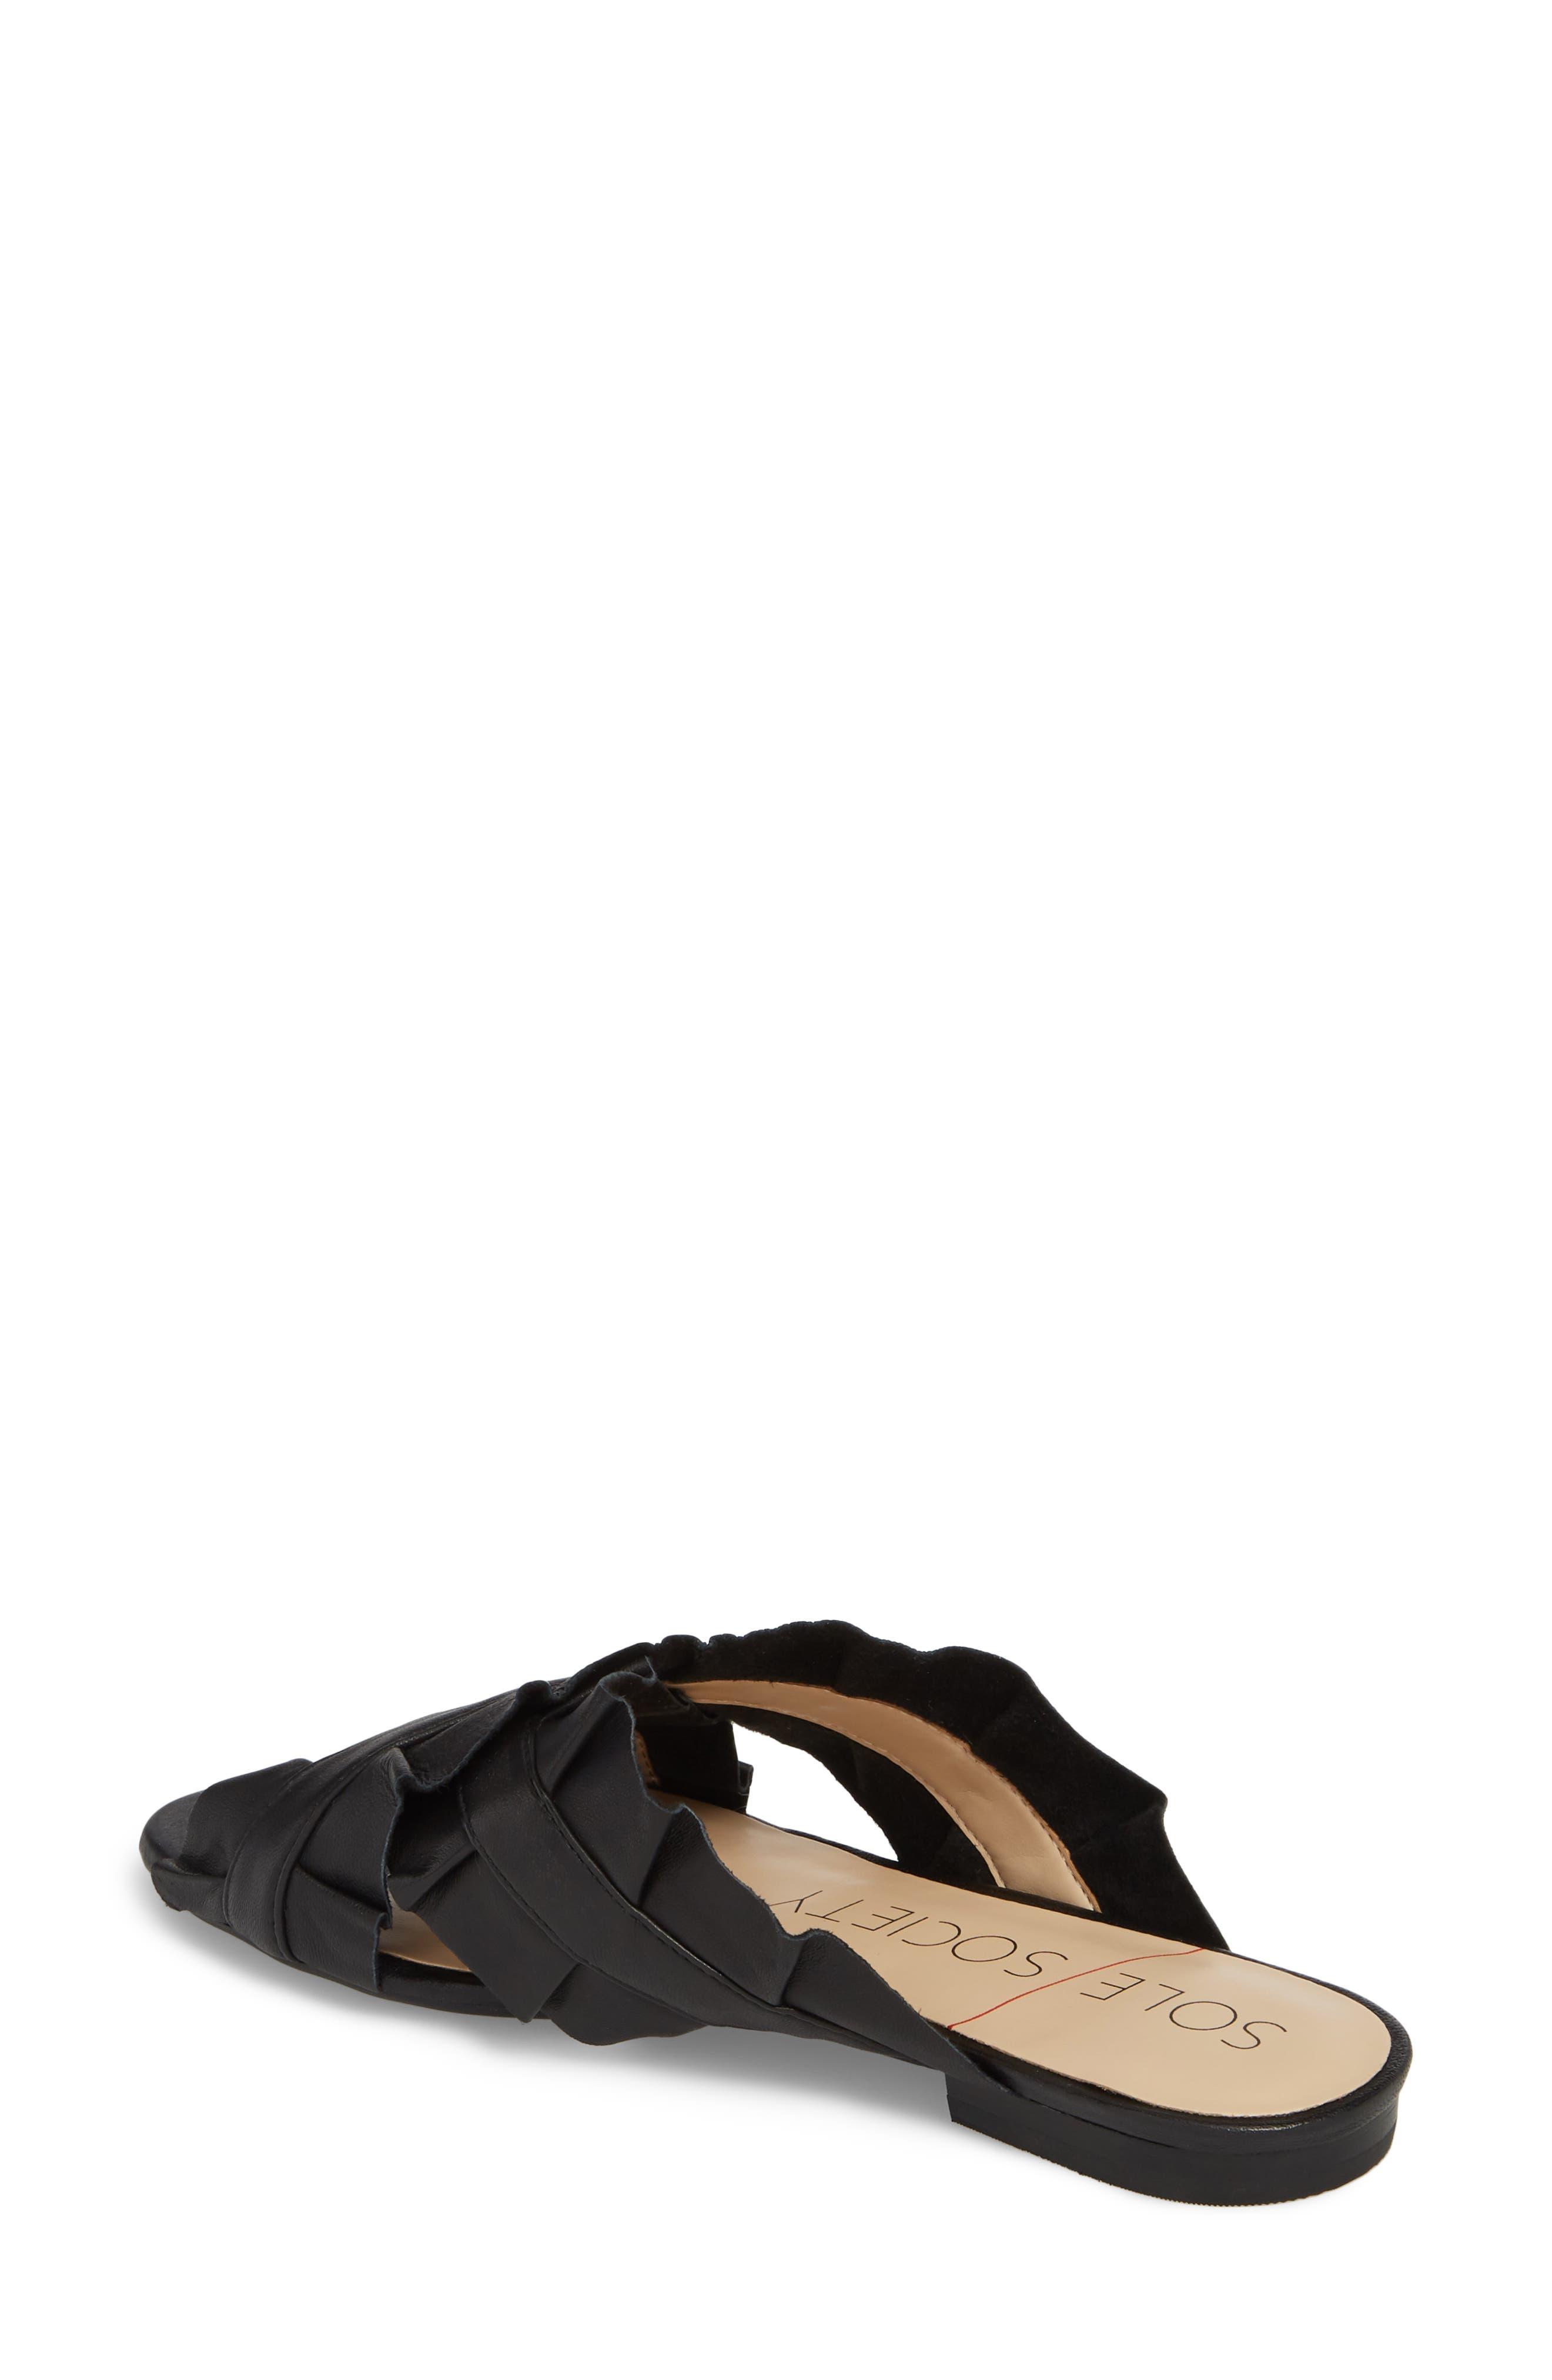 SOLE SOCIETY,                             Mandi Slide Sandal,                             Alternate thumbnail 2, color,                             BLACK